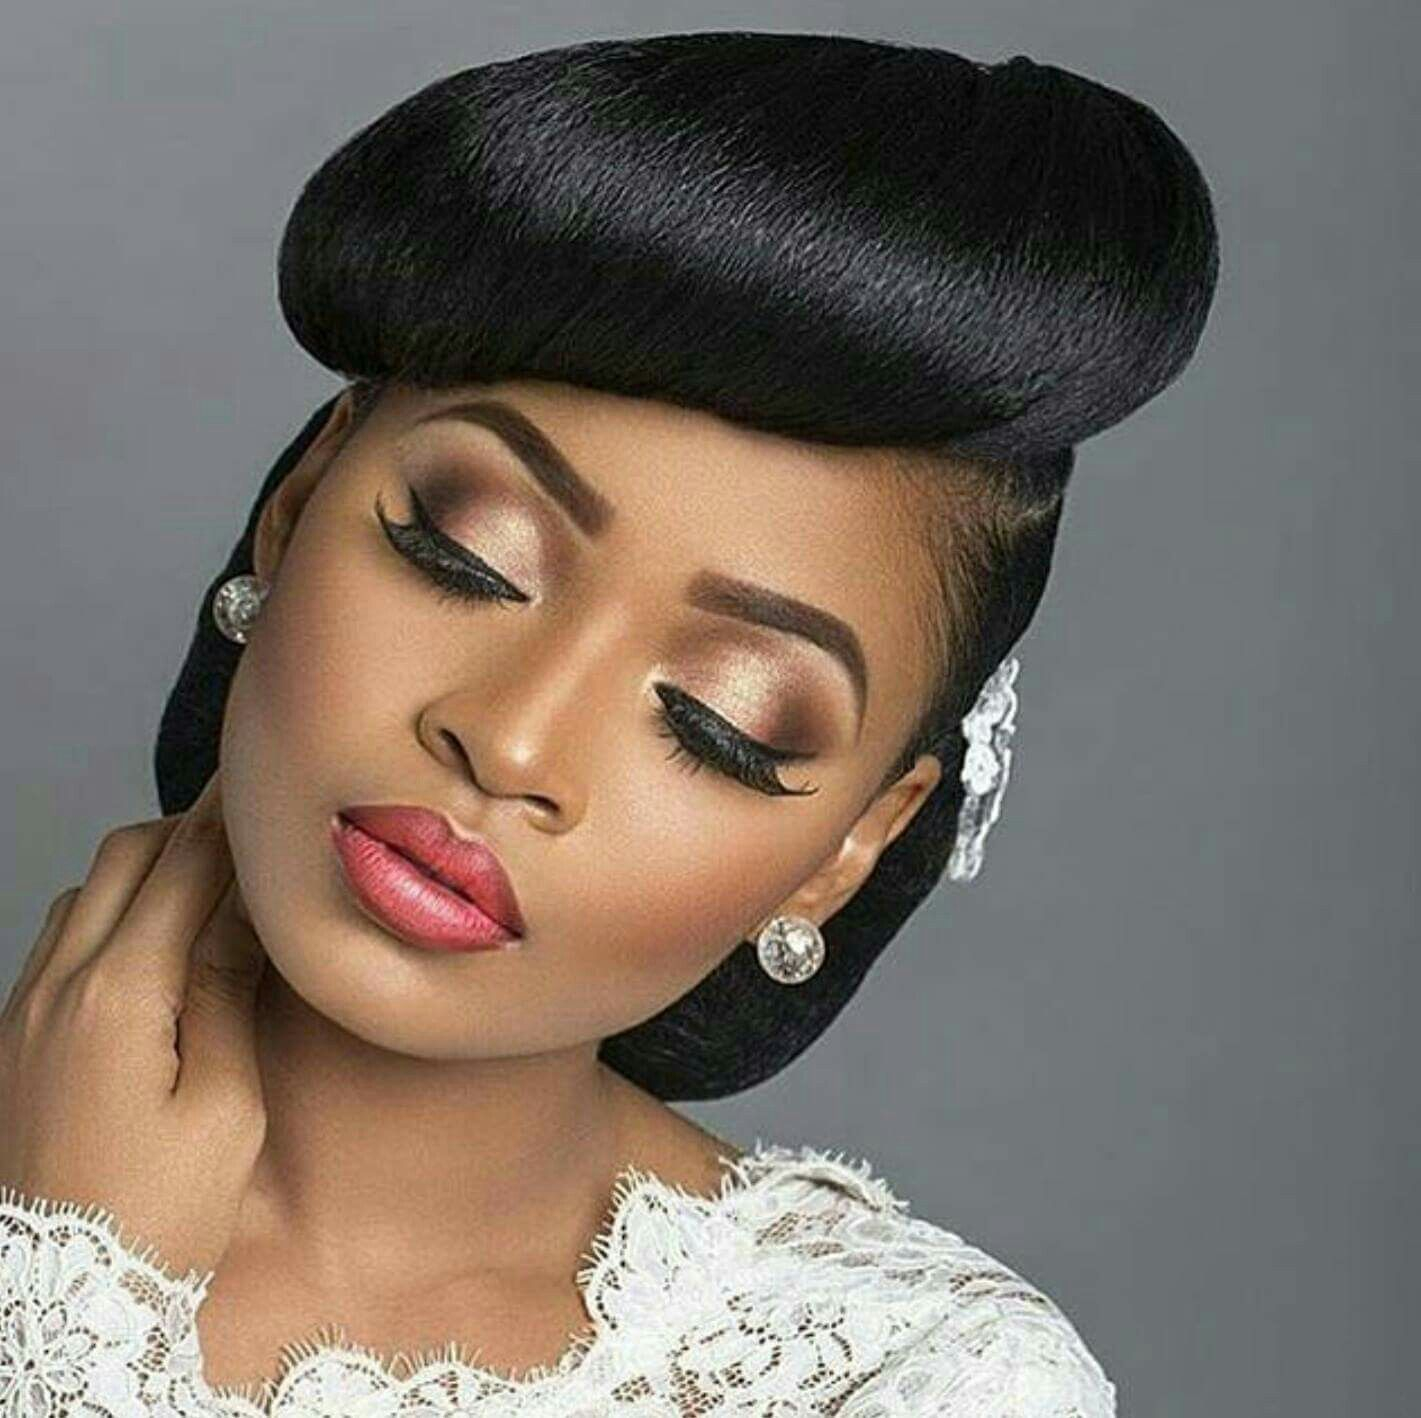 Wedding Hairstyle Makeup: Pin By Karleigh Hannah On Bride Makeup